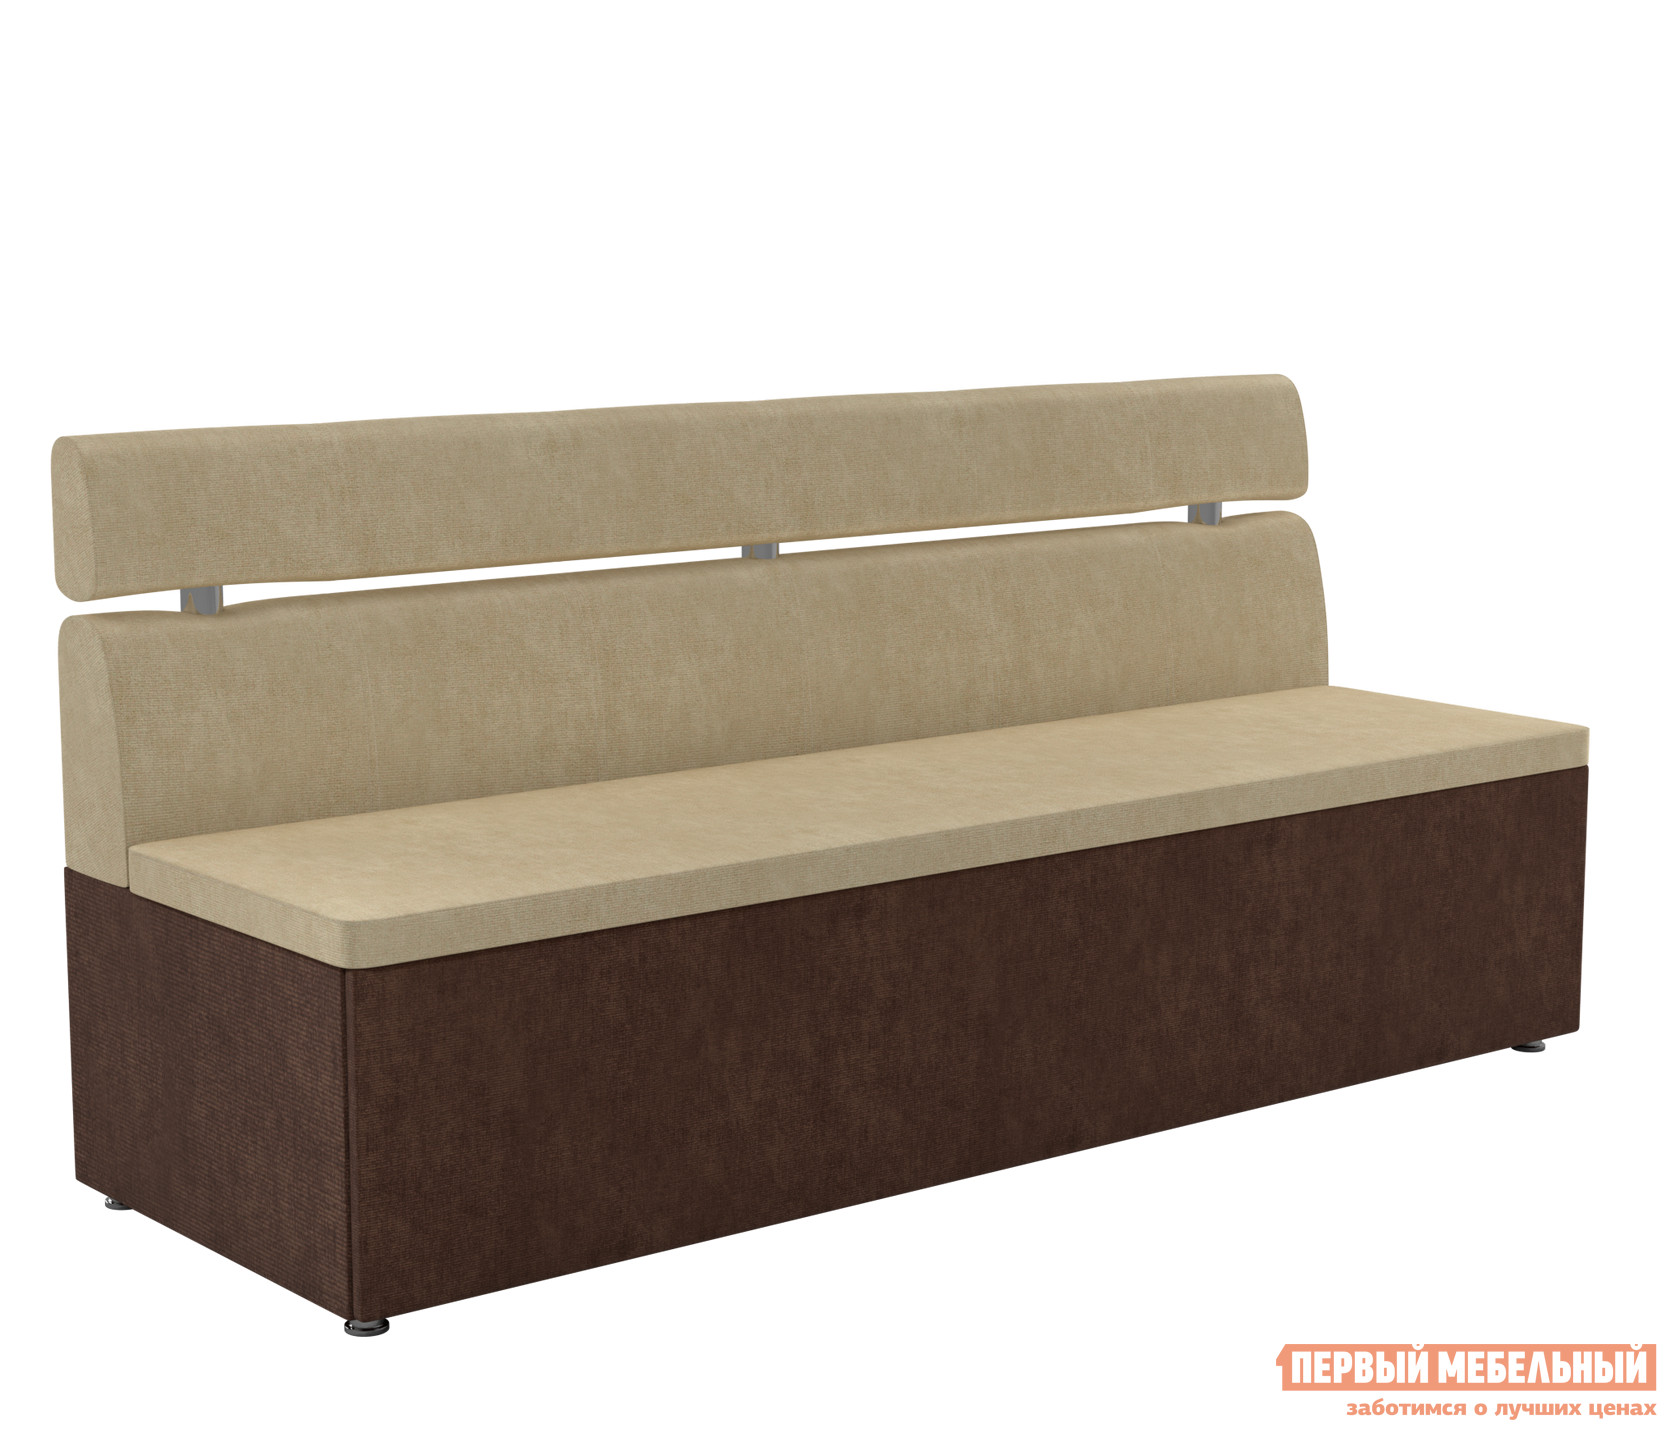 Кухонный диван Мебелико Кухонный диван Классик кожаный диван nanxi home furniture 123